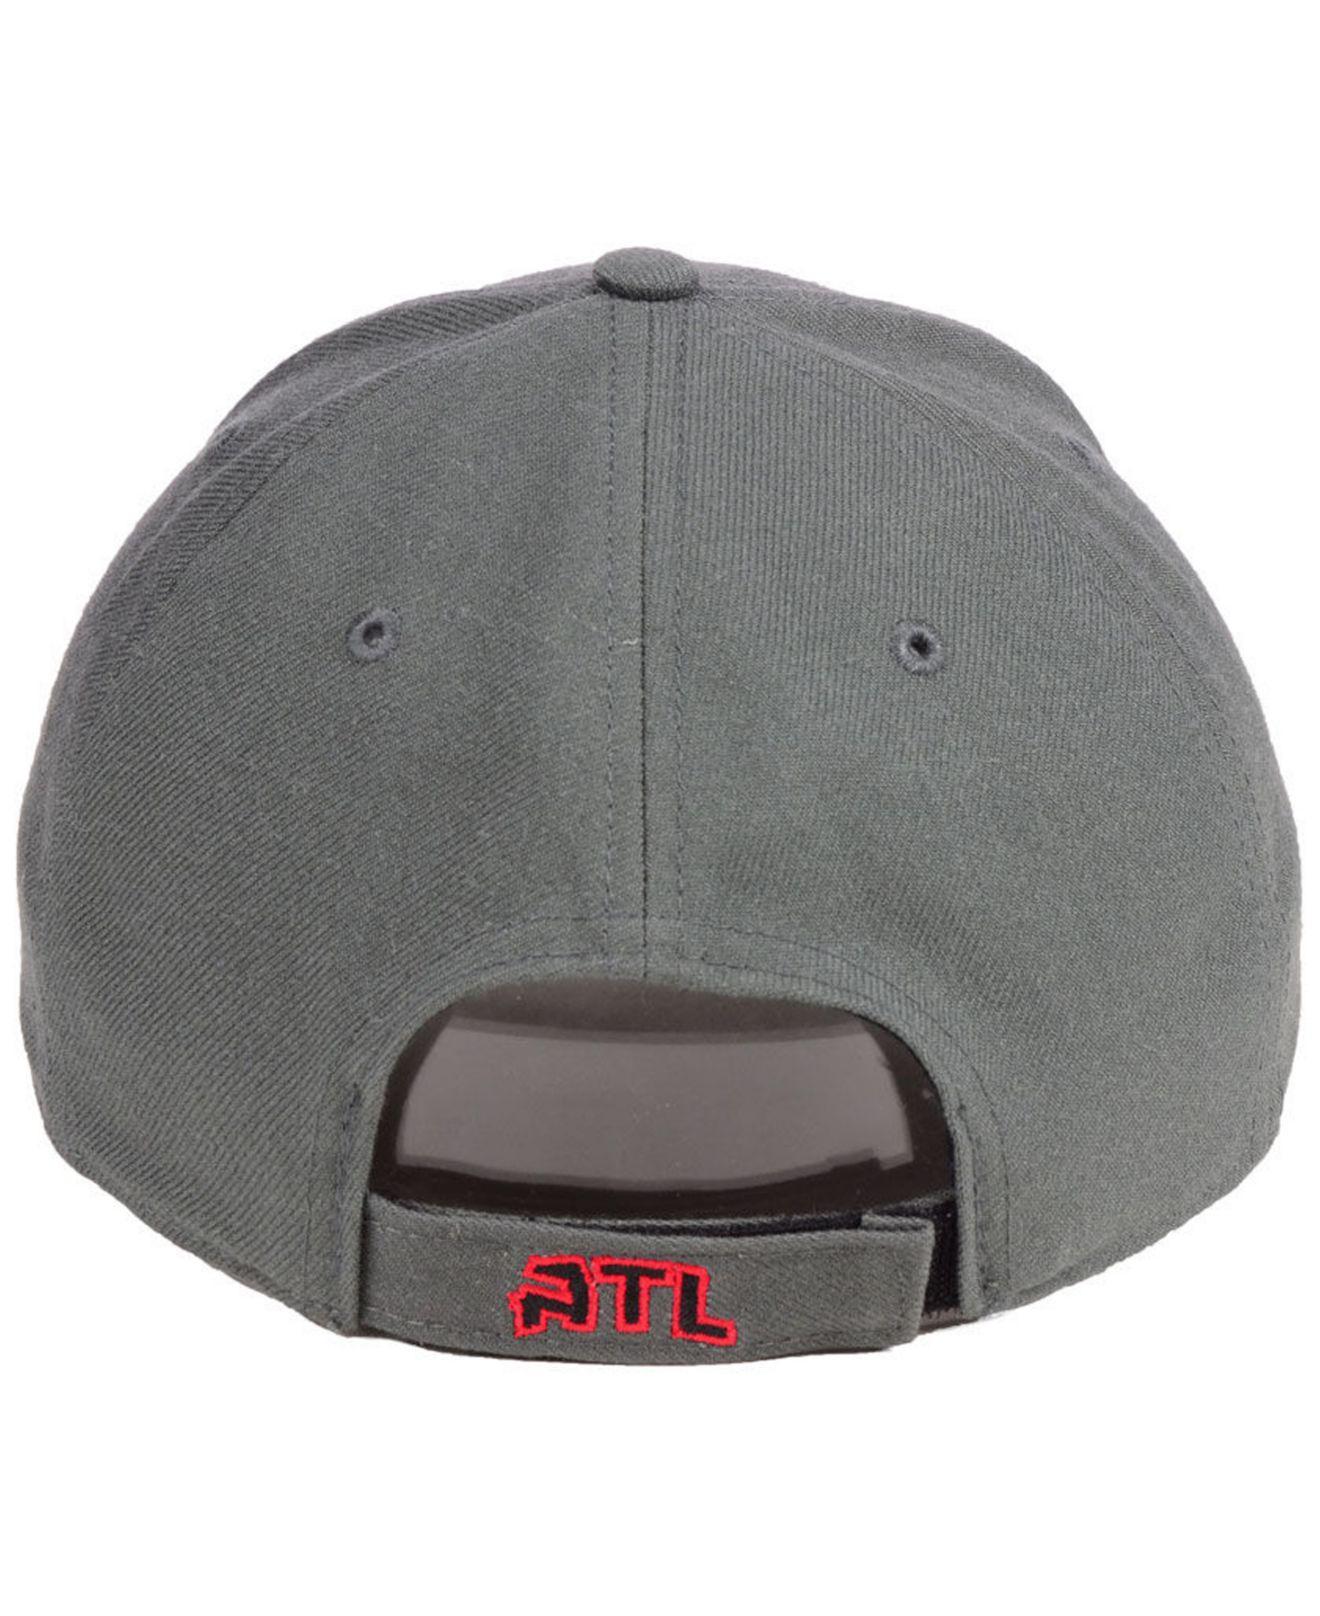 promo code 387f4 b4226 ... discount code for 47 brand gray atlanta hawks charcoal pop mvp cap for men  lyst.